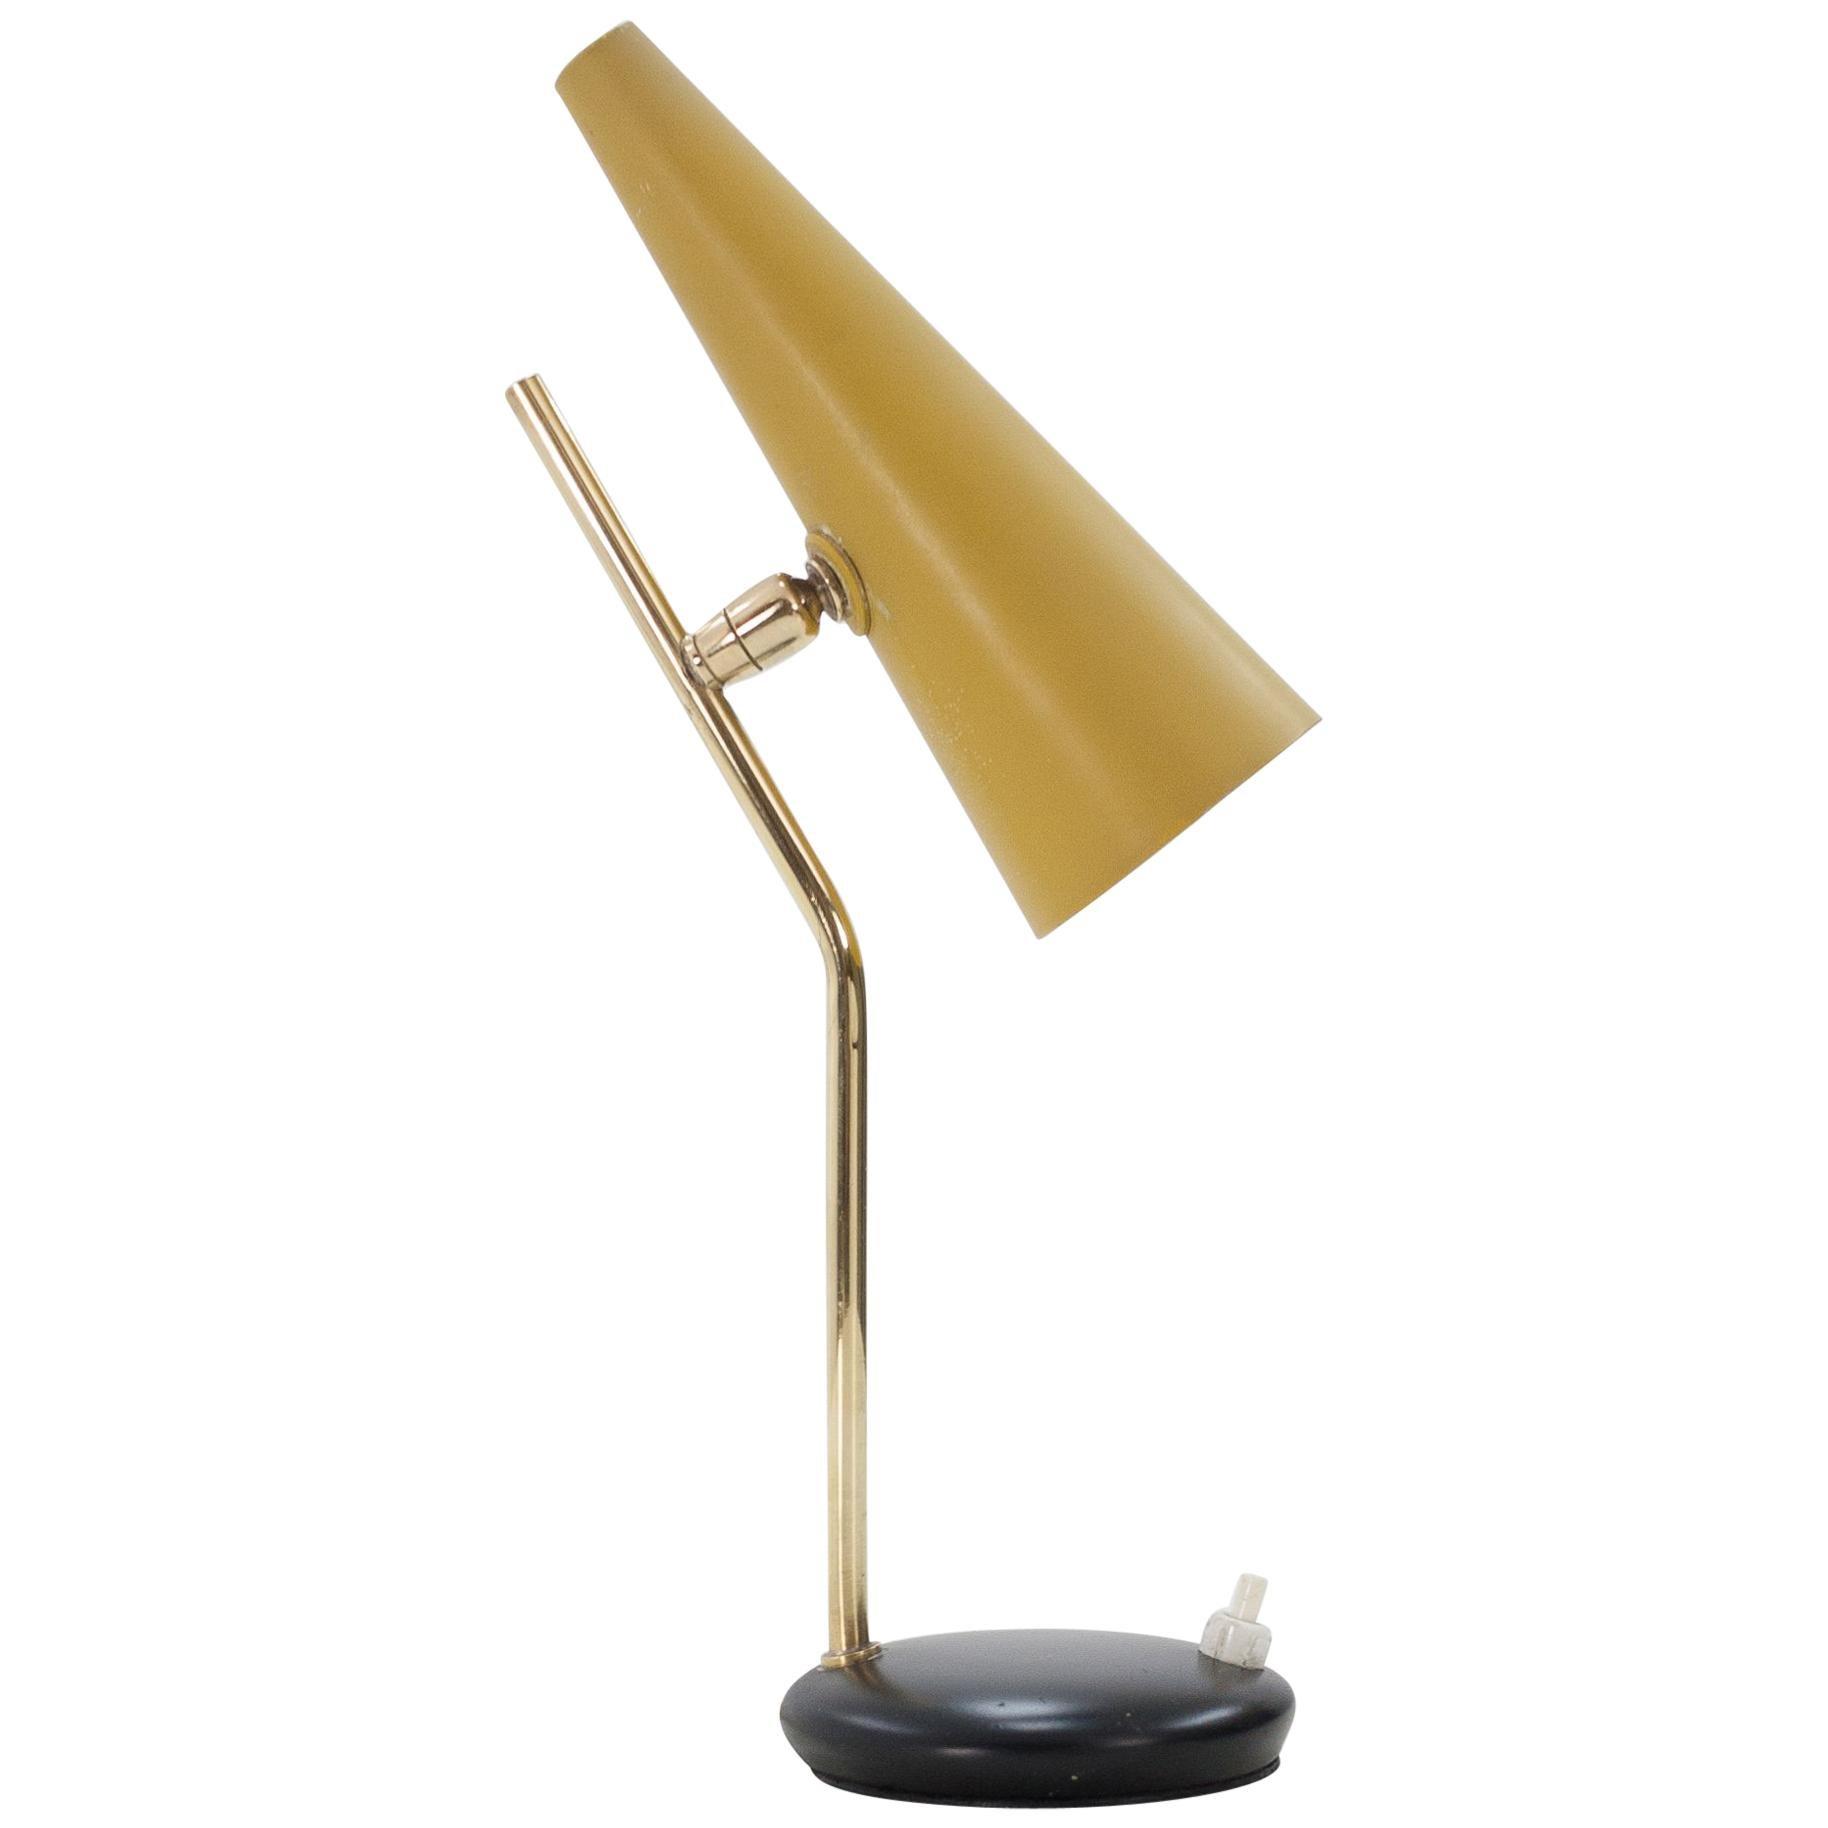 Italian Table Lamp Attributed to Stilnovo